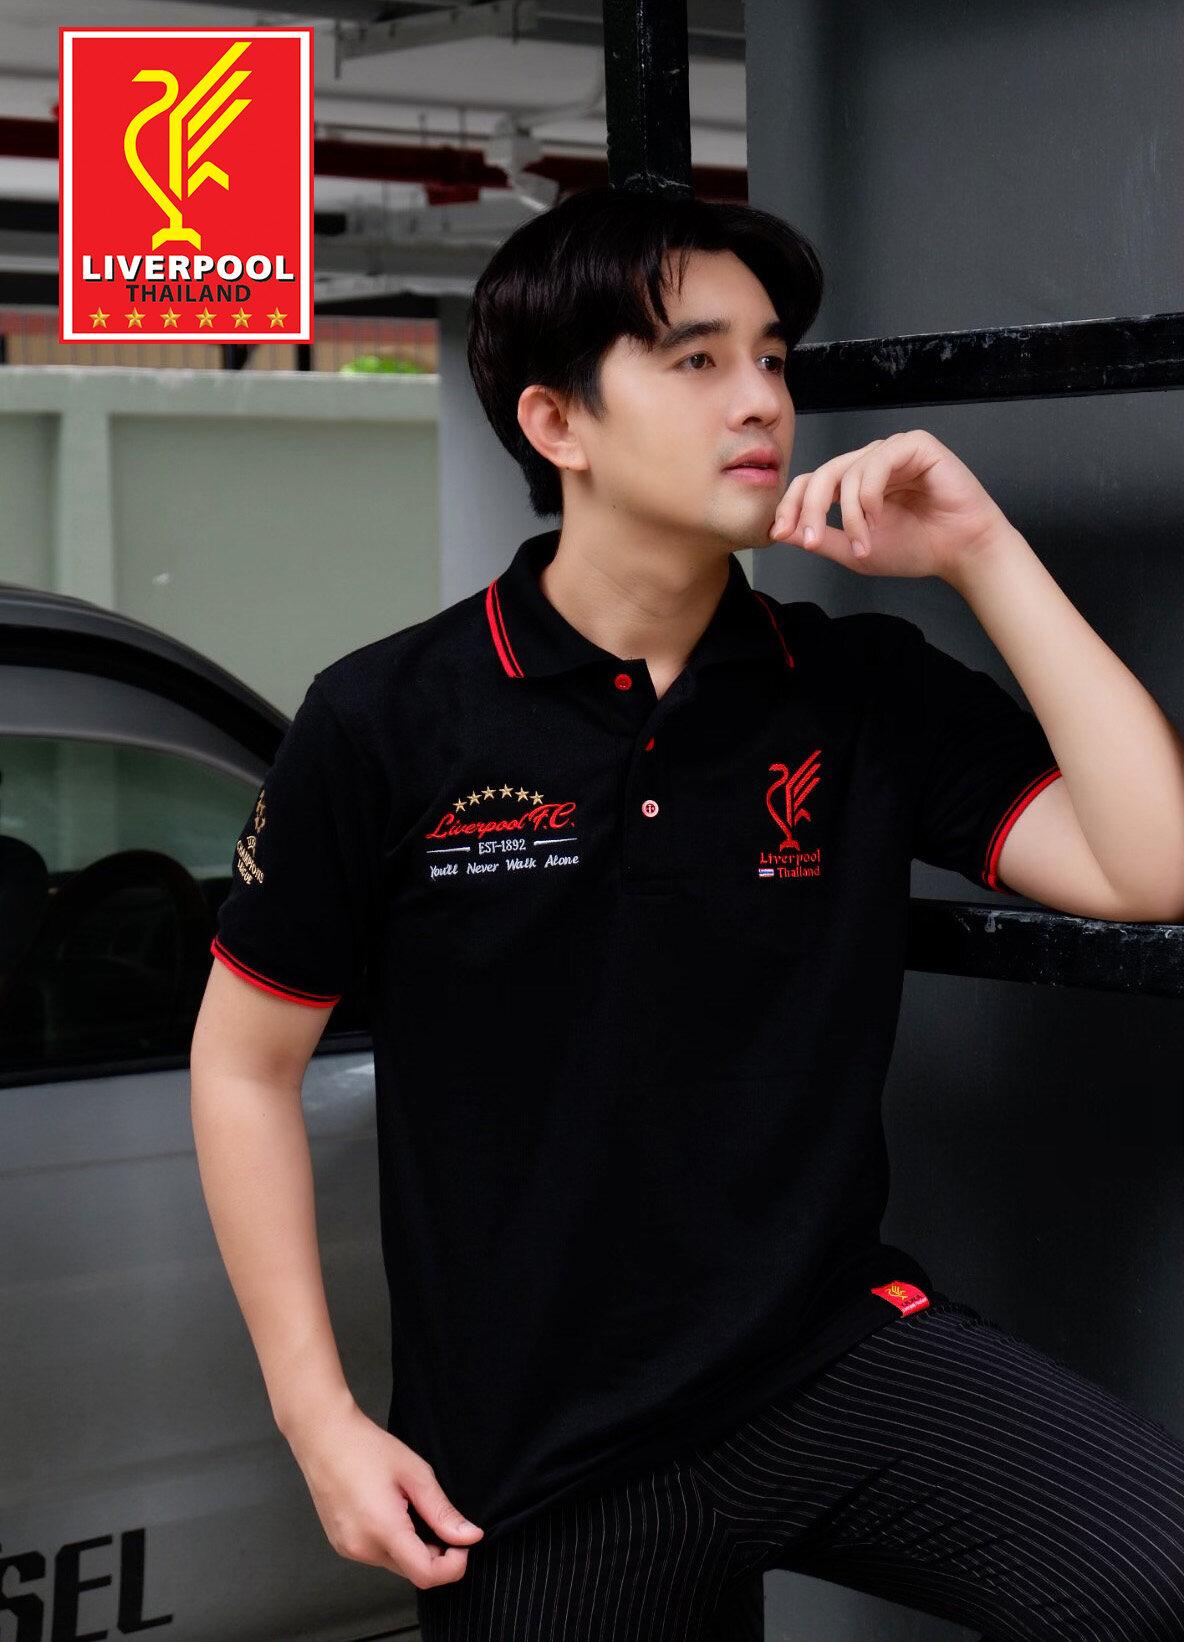 Polo Liverpool Thailand ชาย (ดำ)-Plm037b.